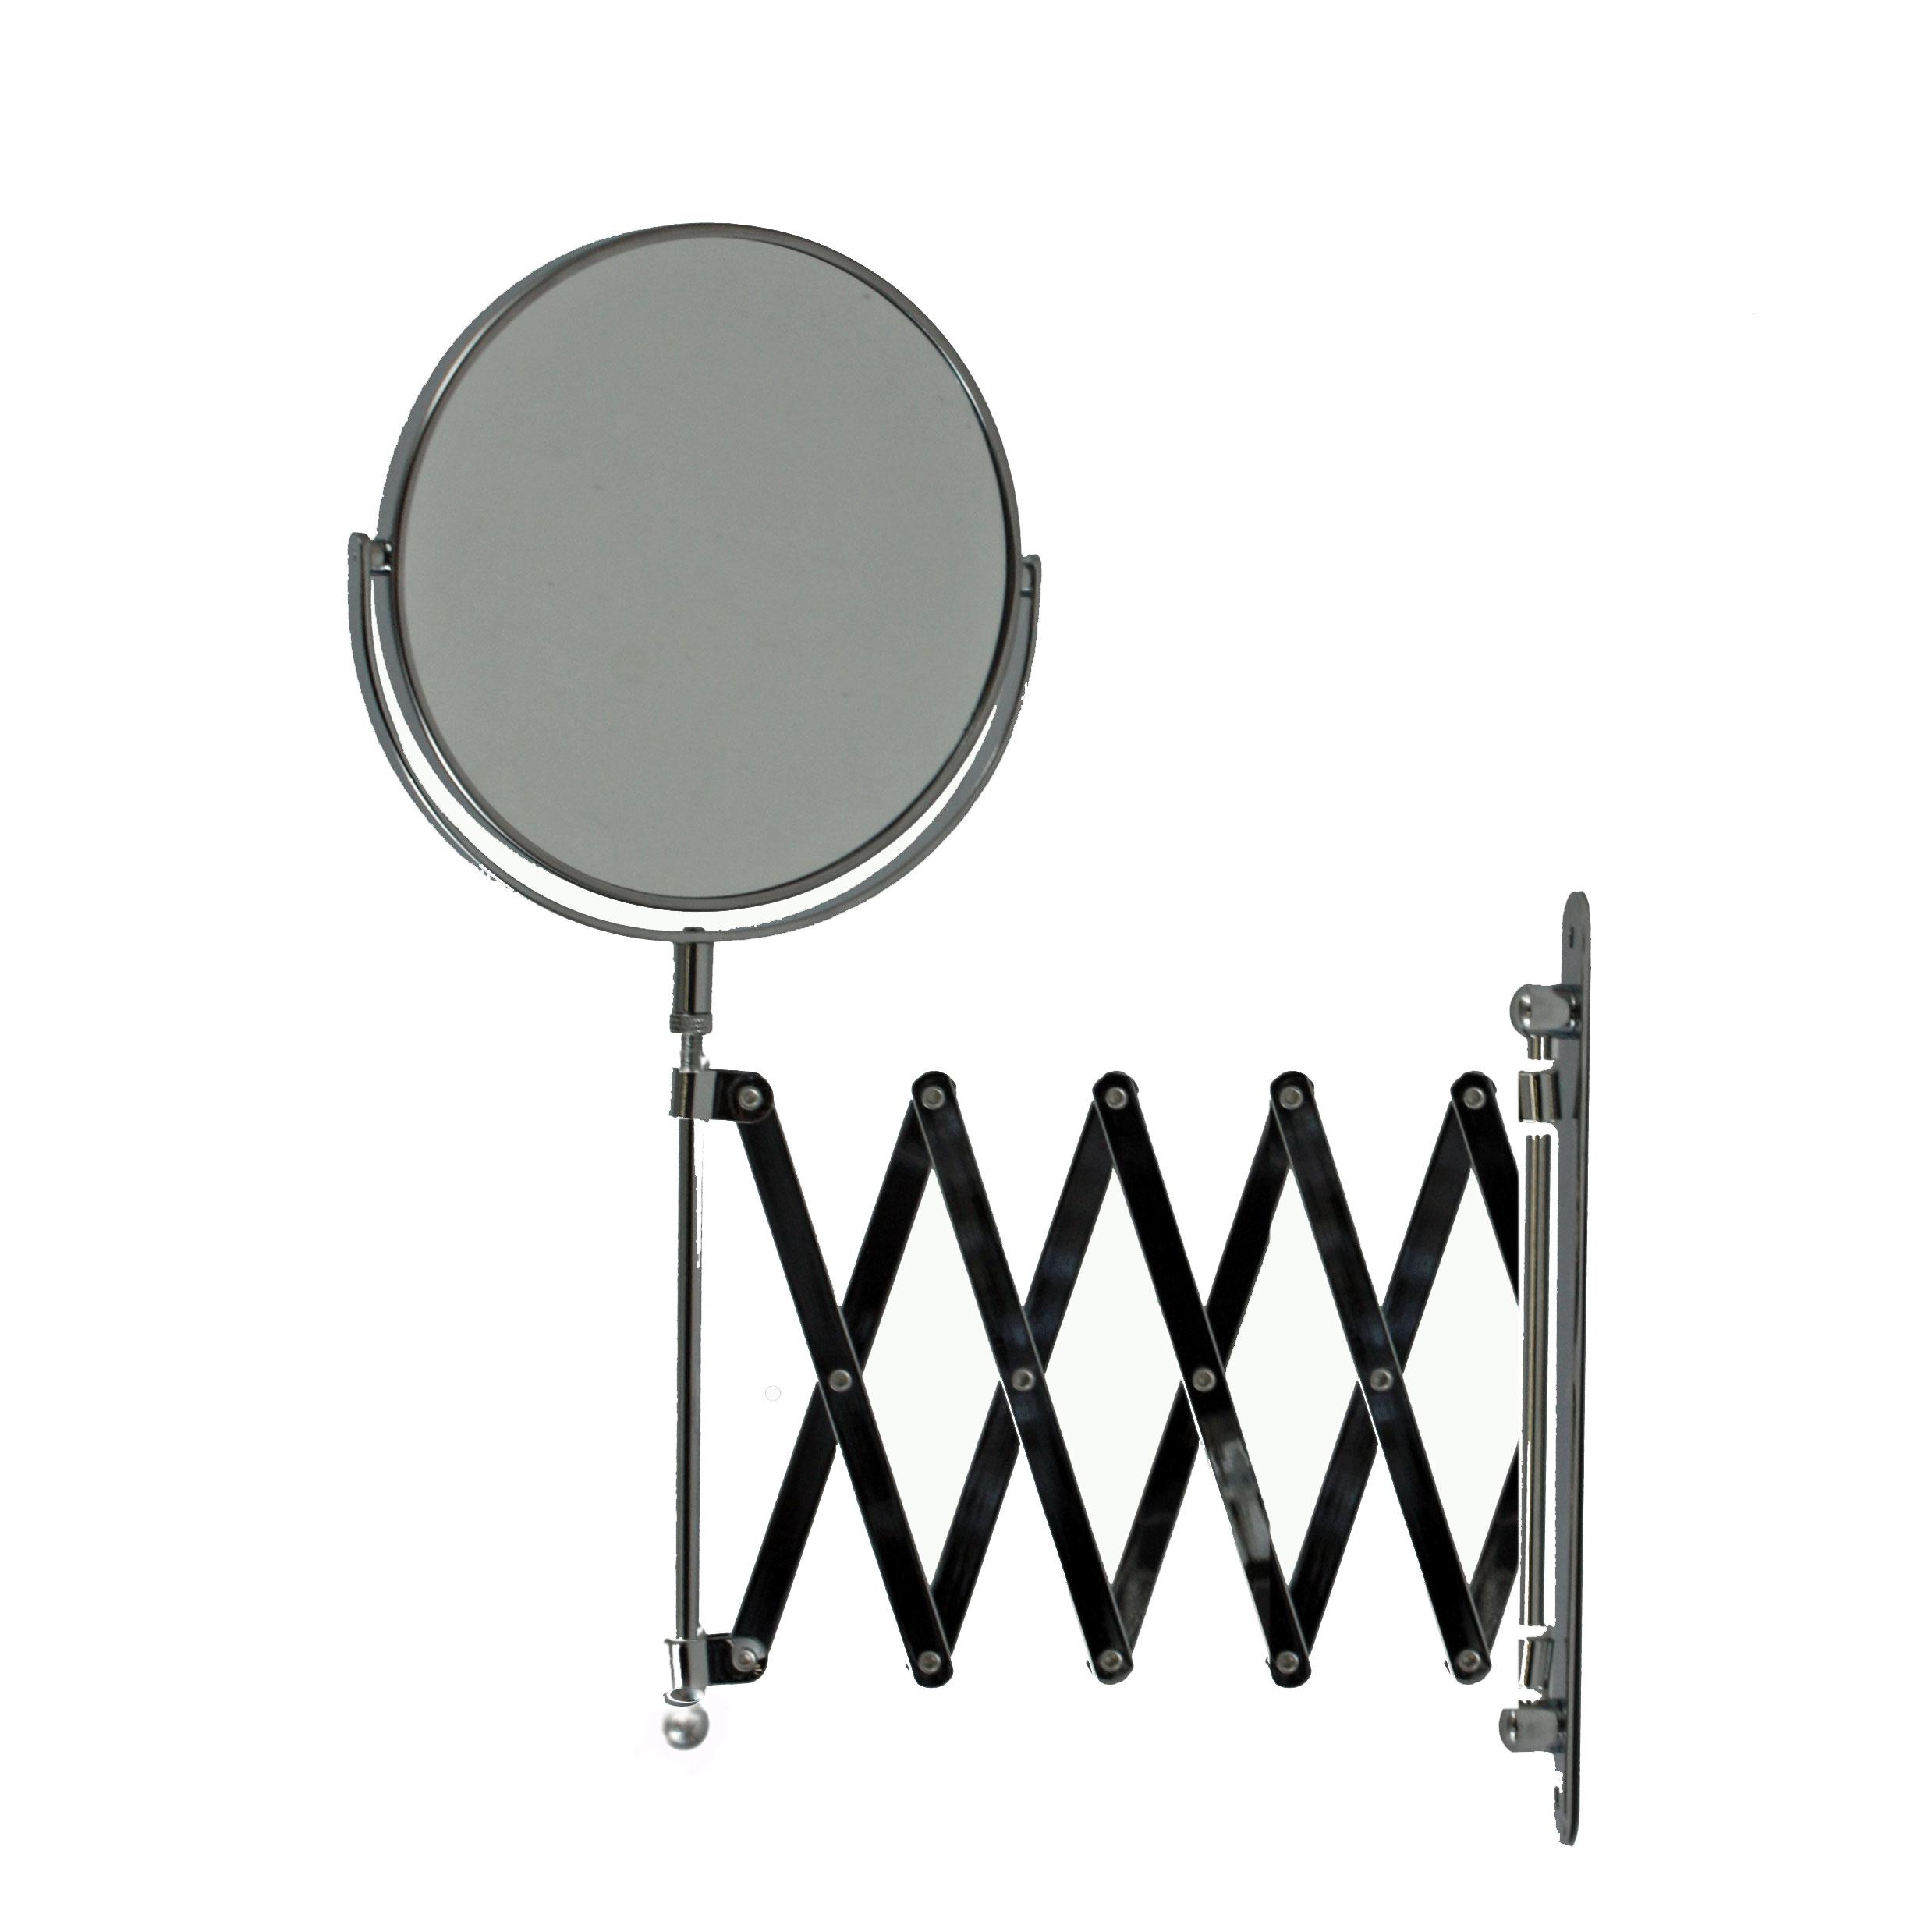 miroir grossissant x30